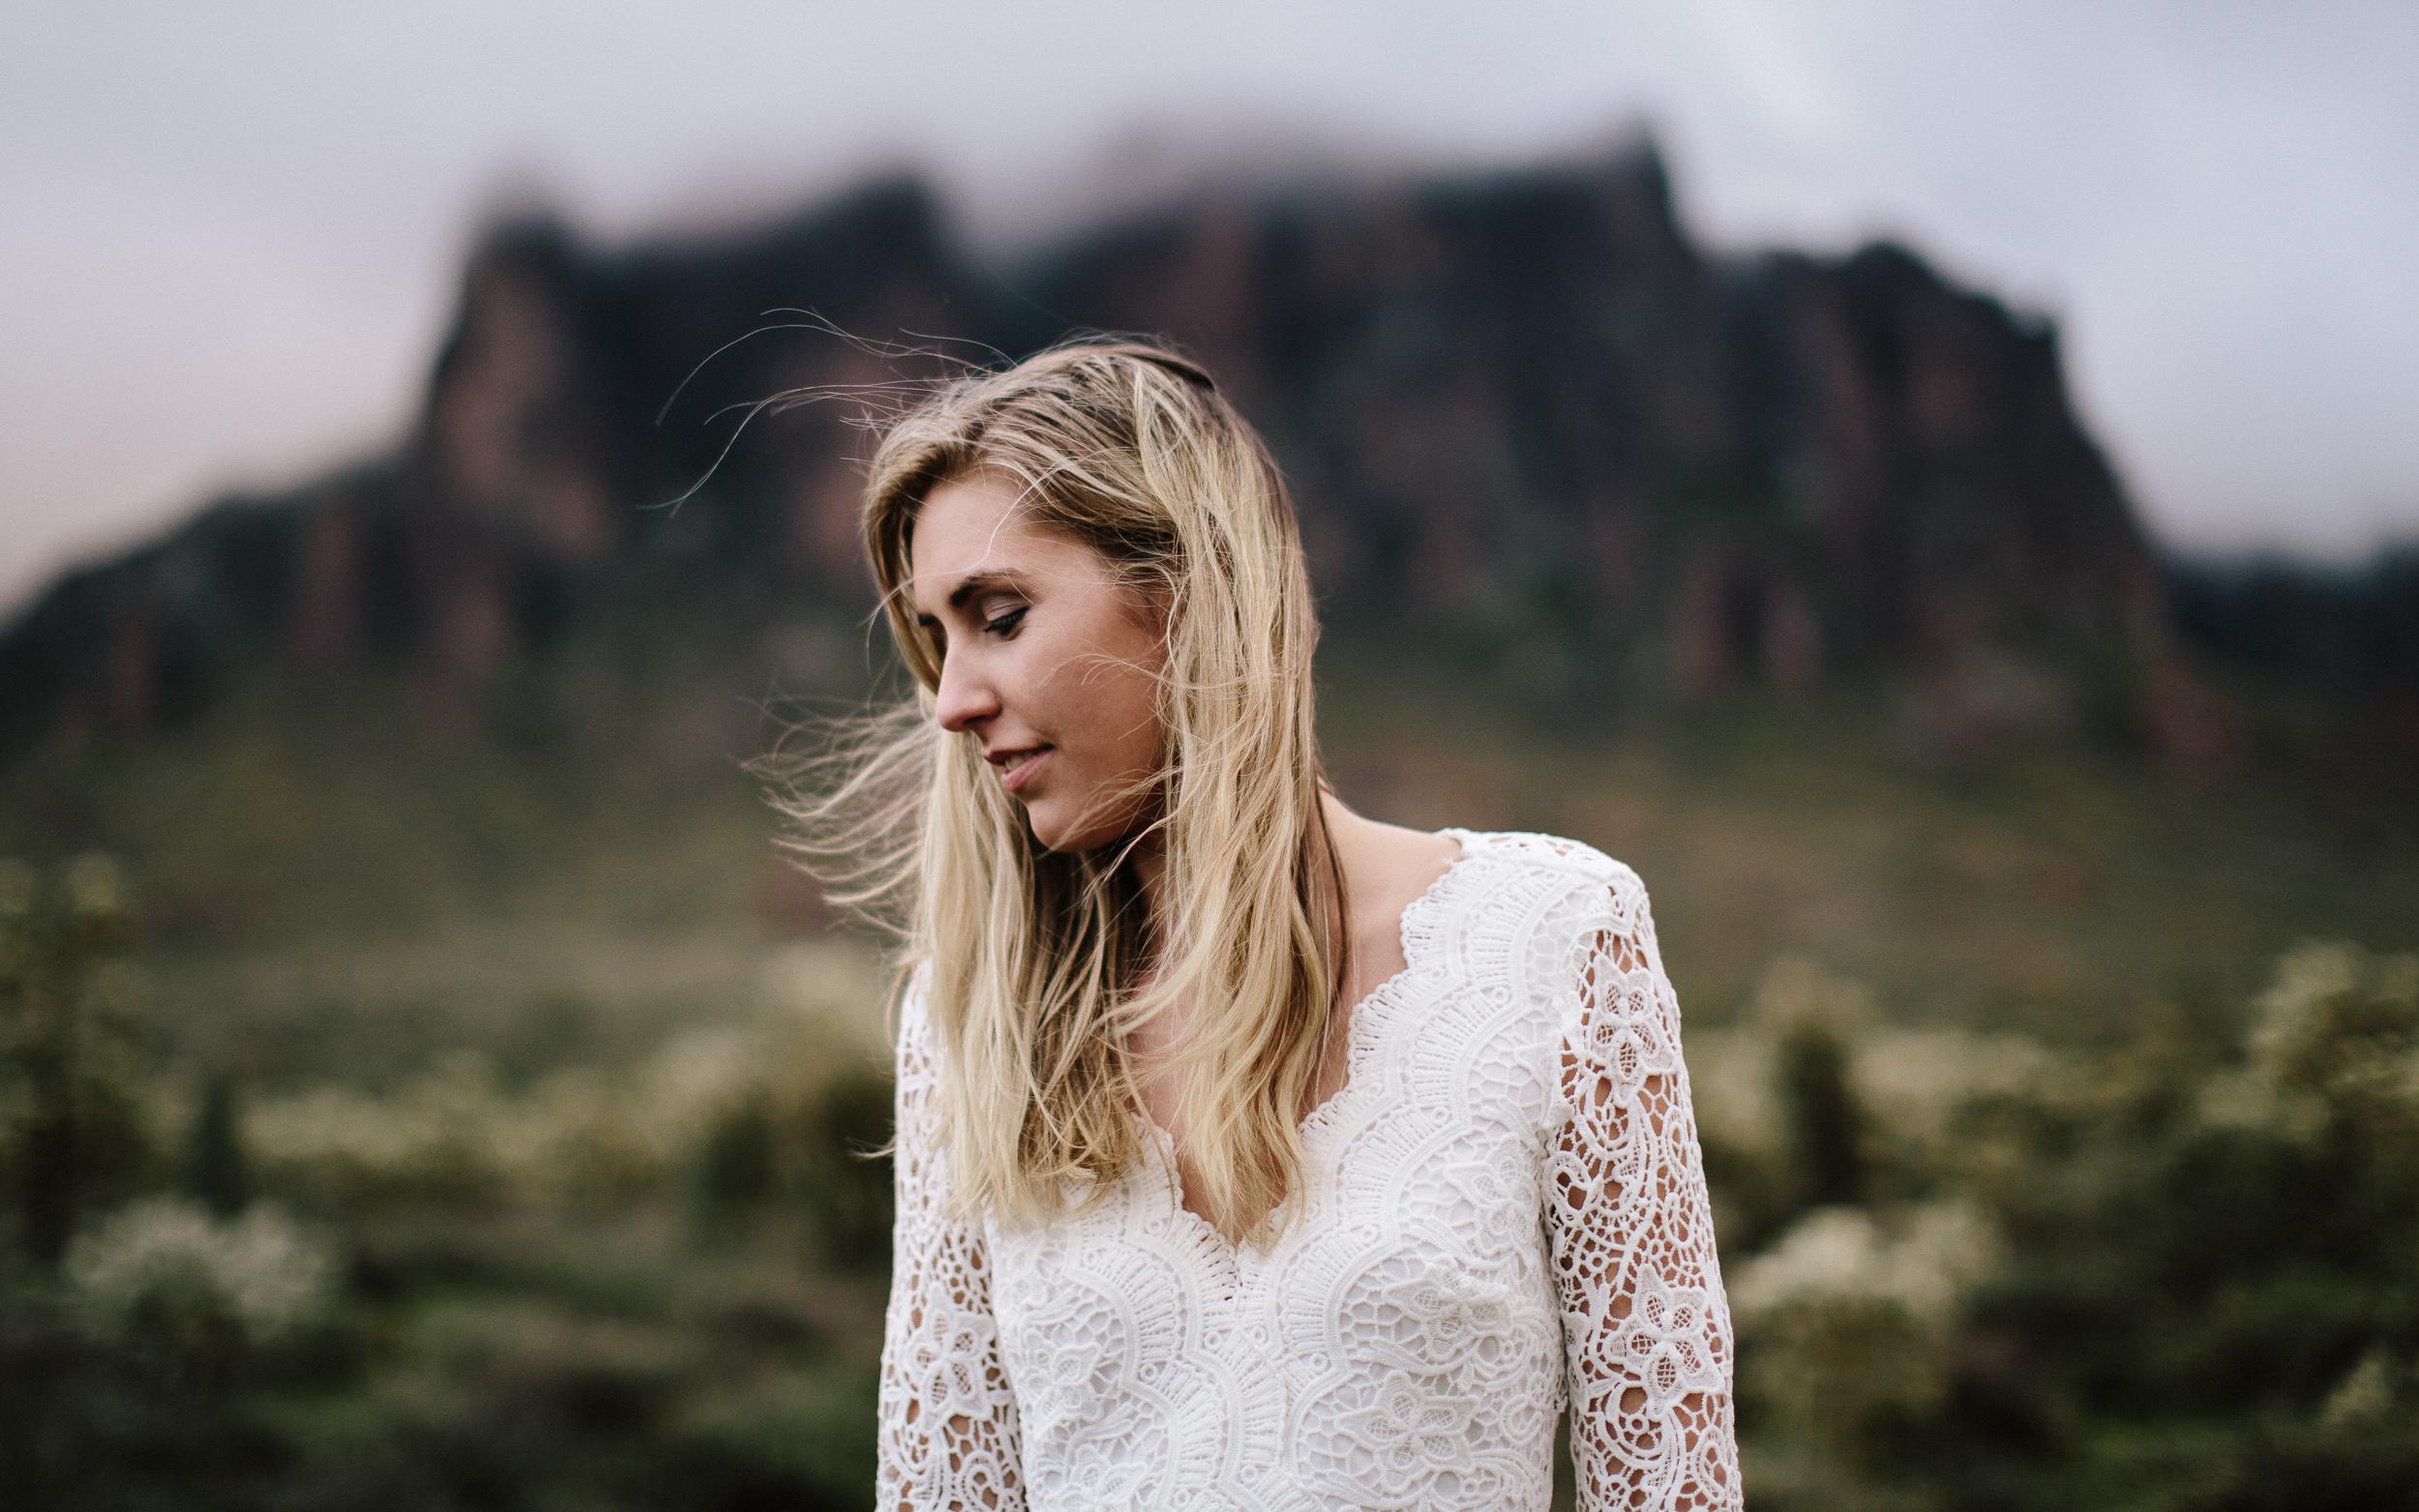 phoenix-mesa-elopement-wedding-photographer-lost-dutchman-state-park-superstitious-mountains-35.jpg